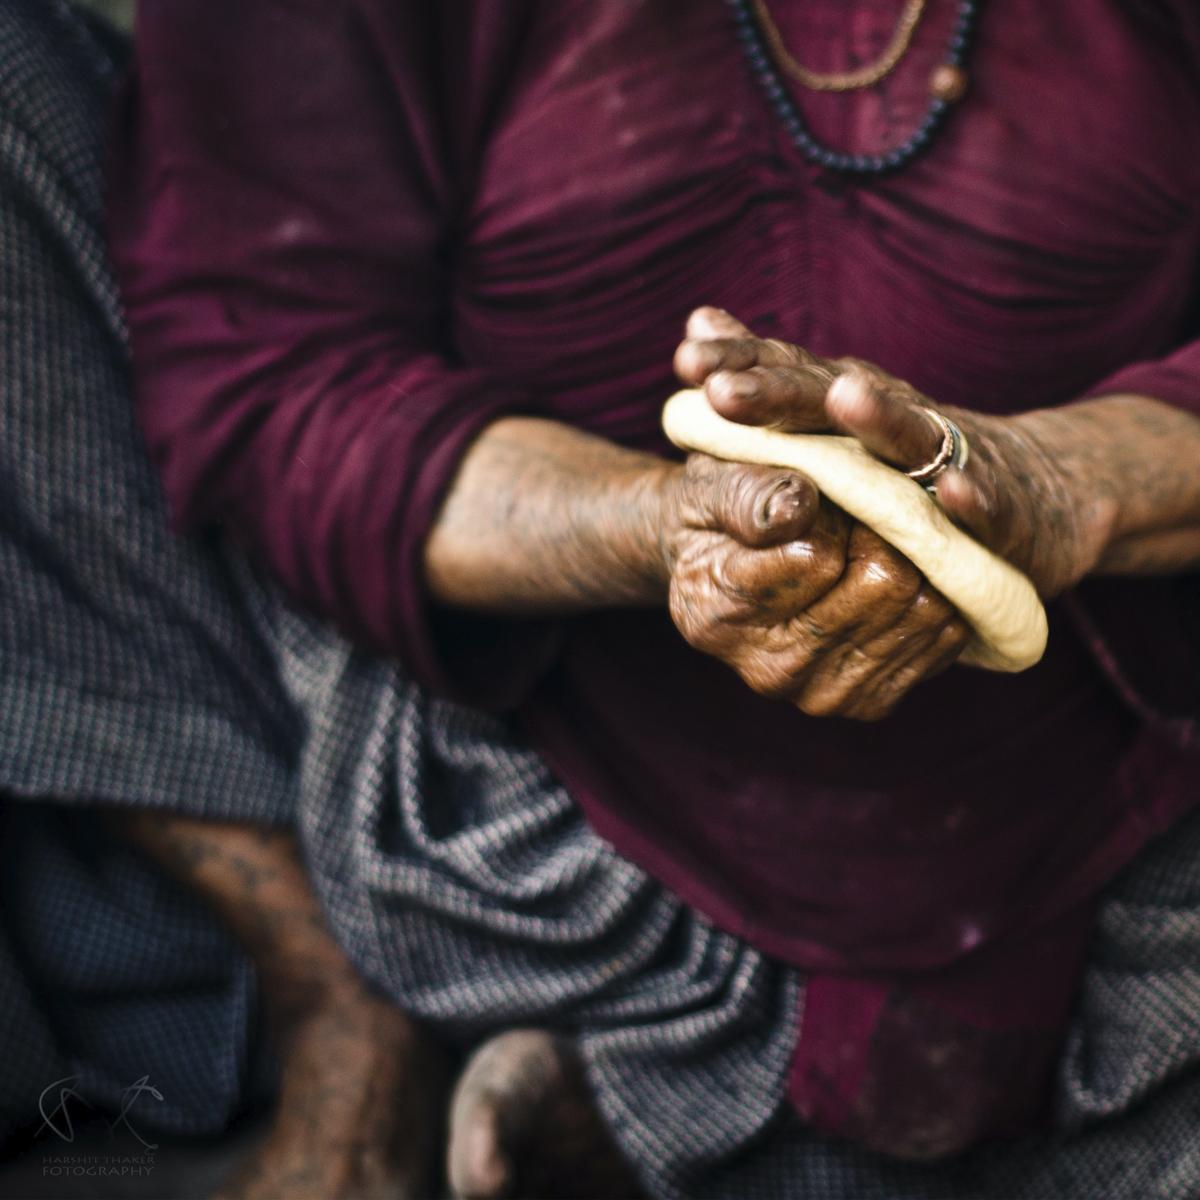 Bread, hands kneading bread